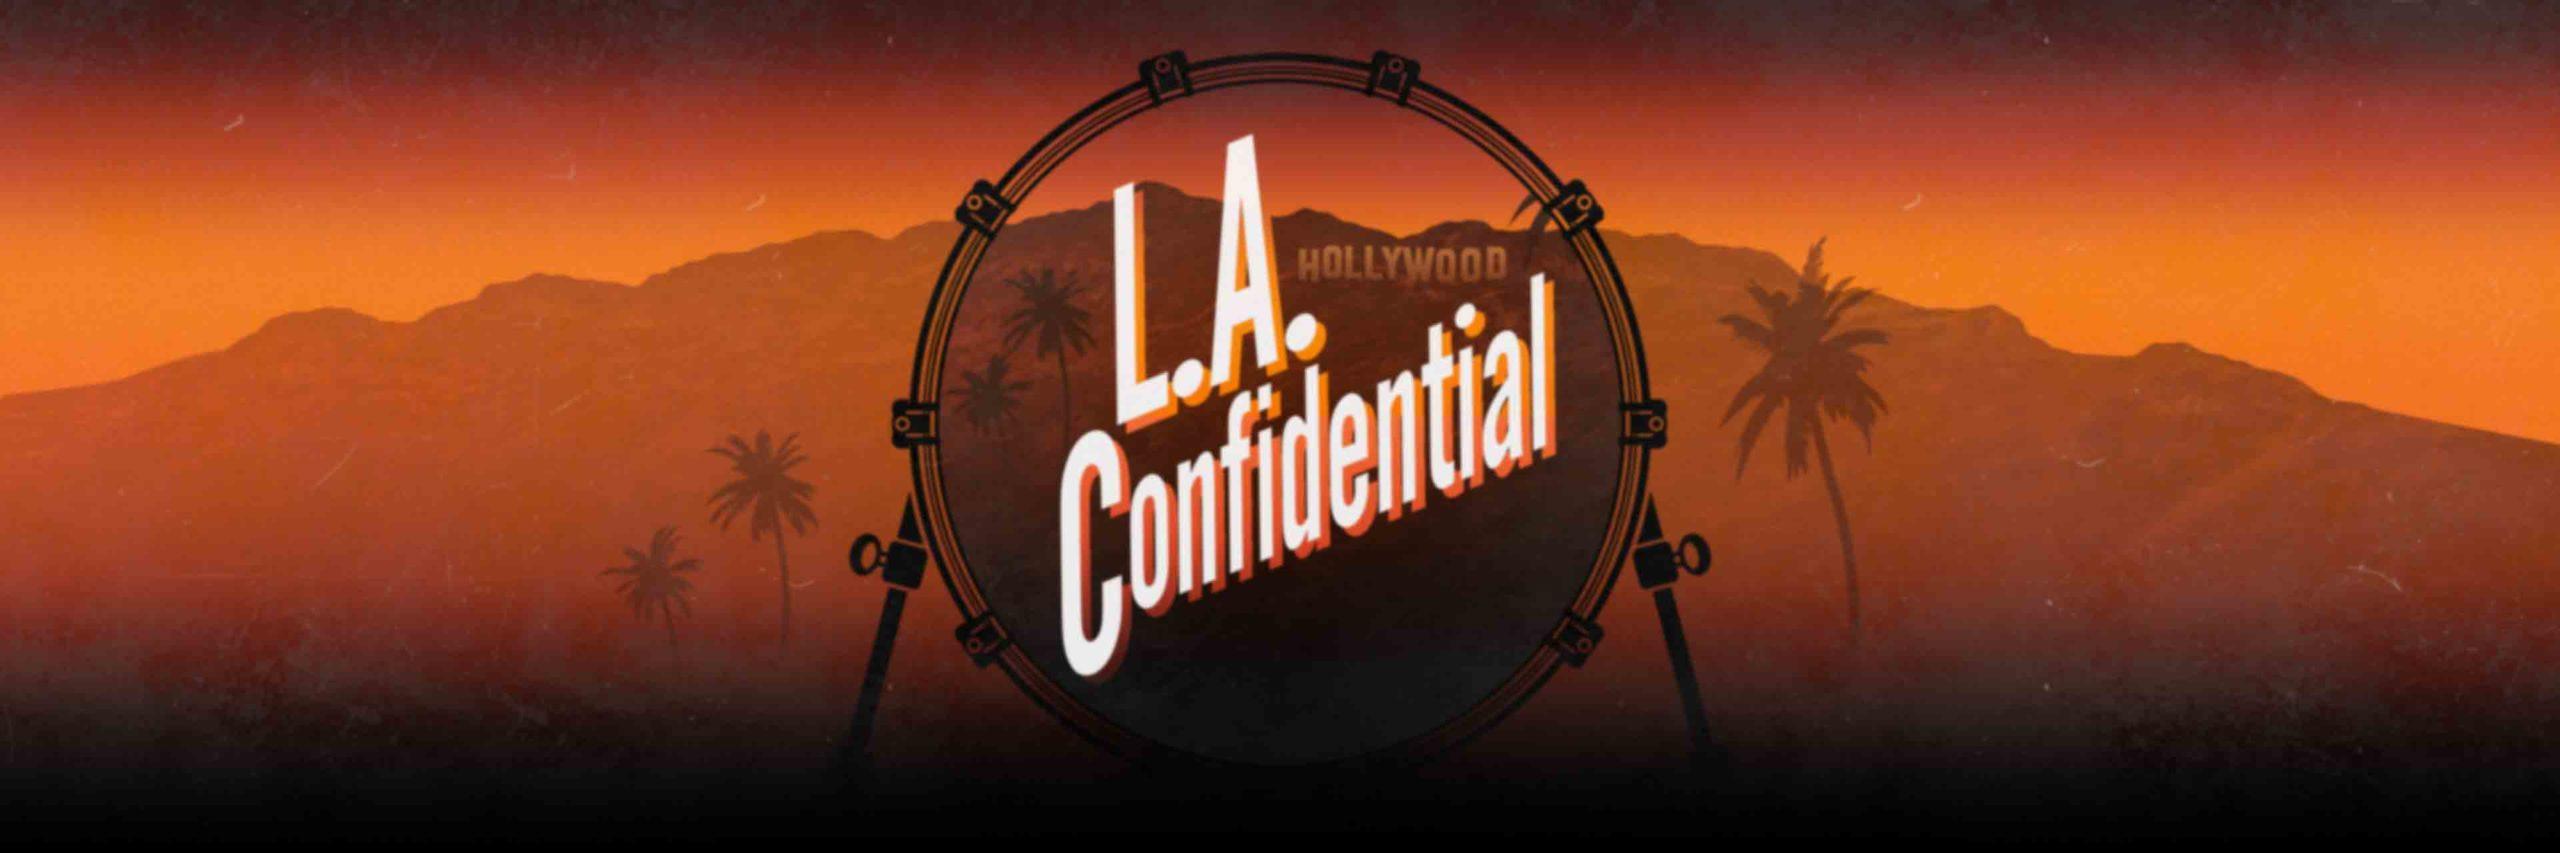 L.A. Confidential Drumlibrary IK Multimedia Coverart